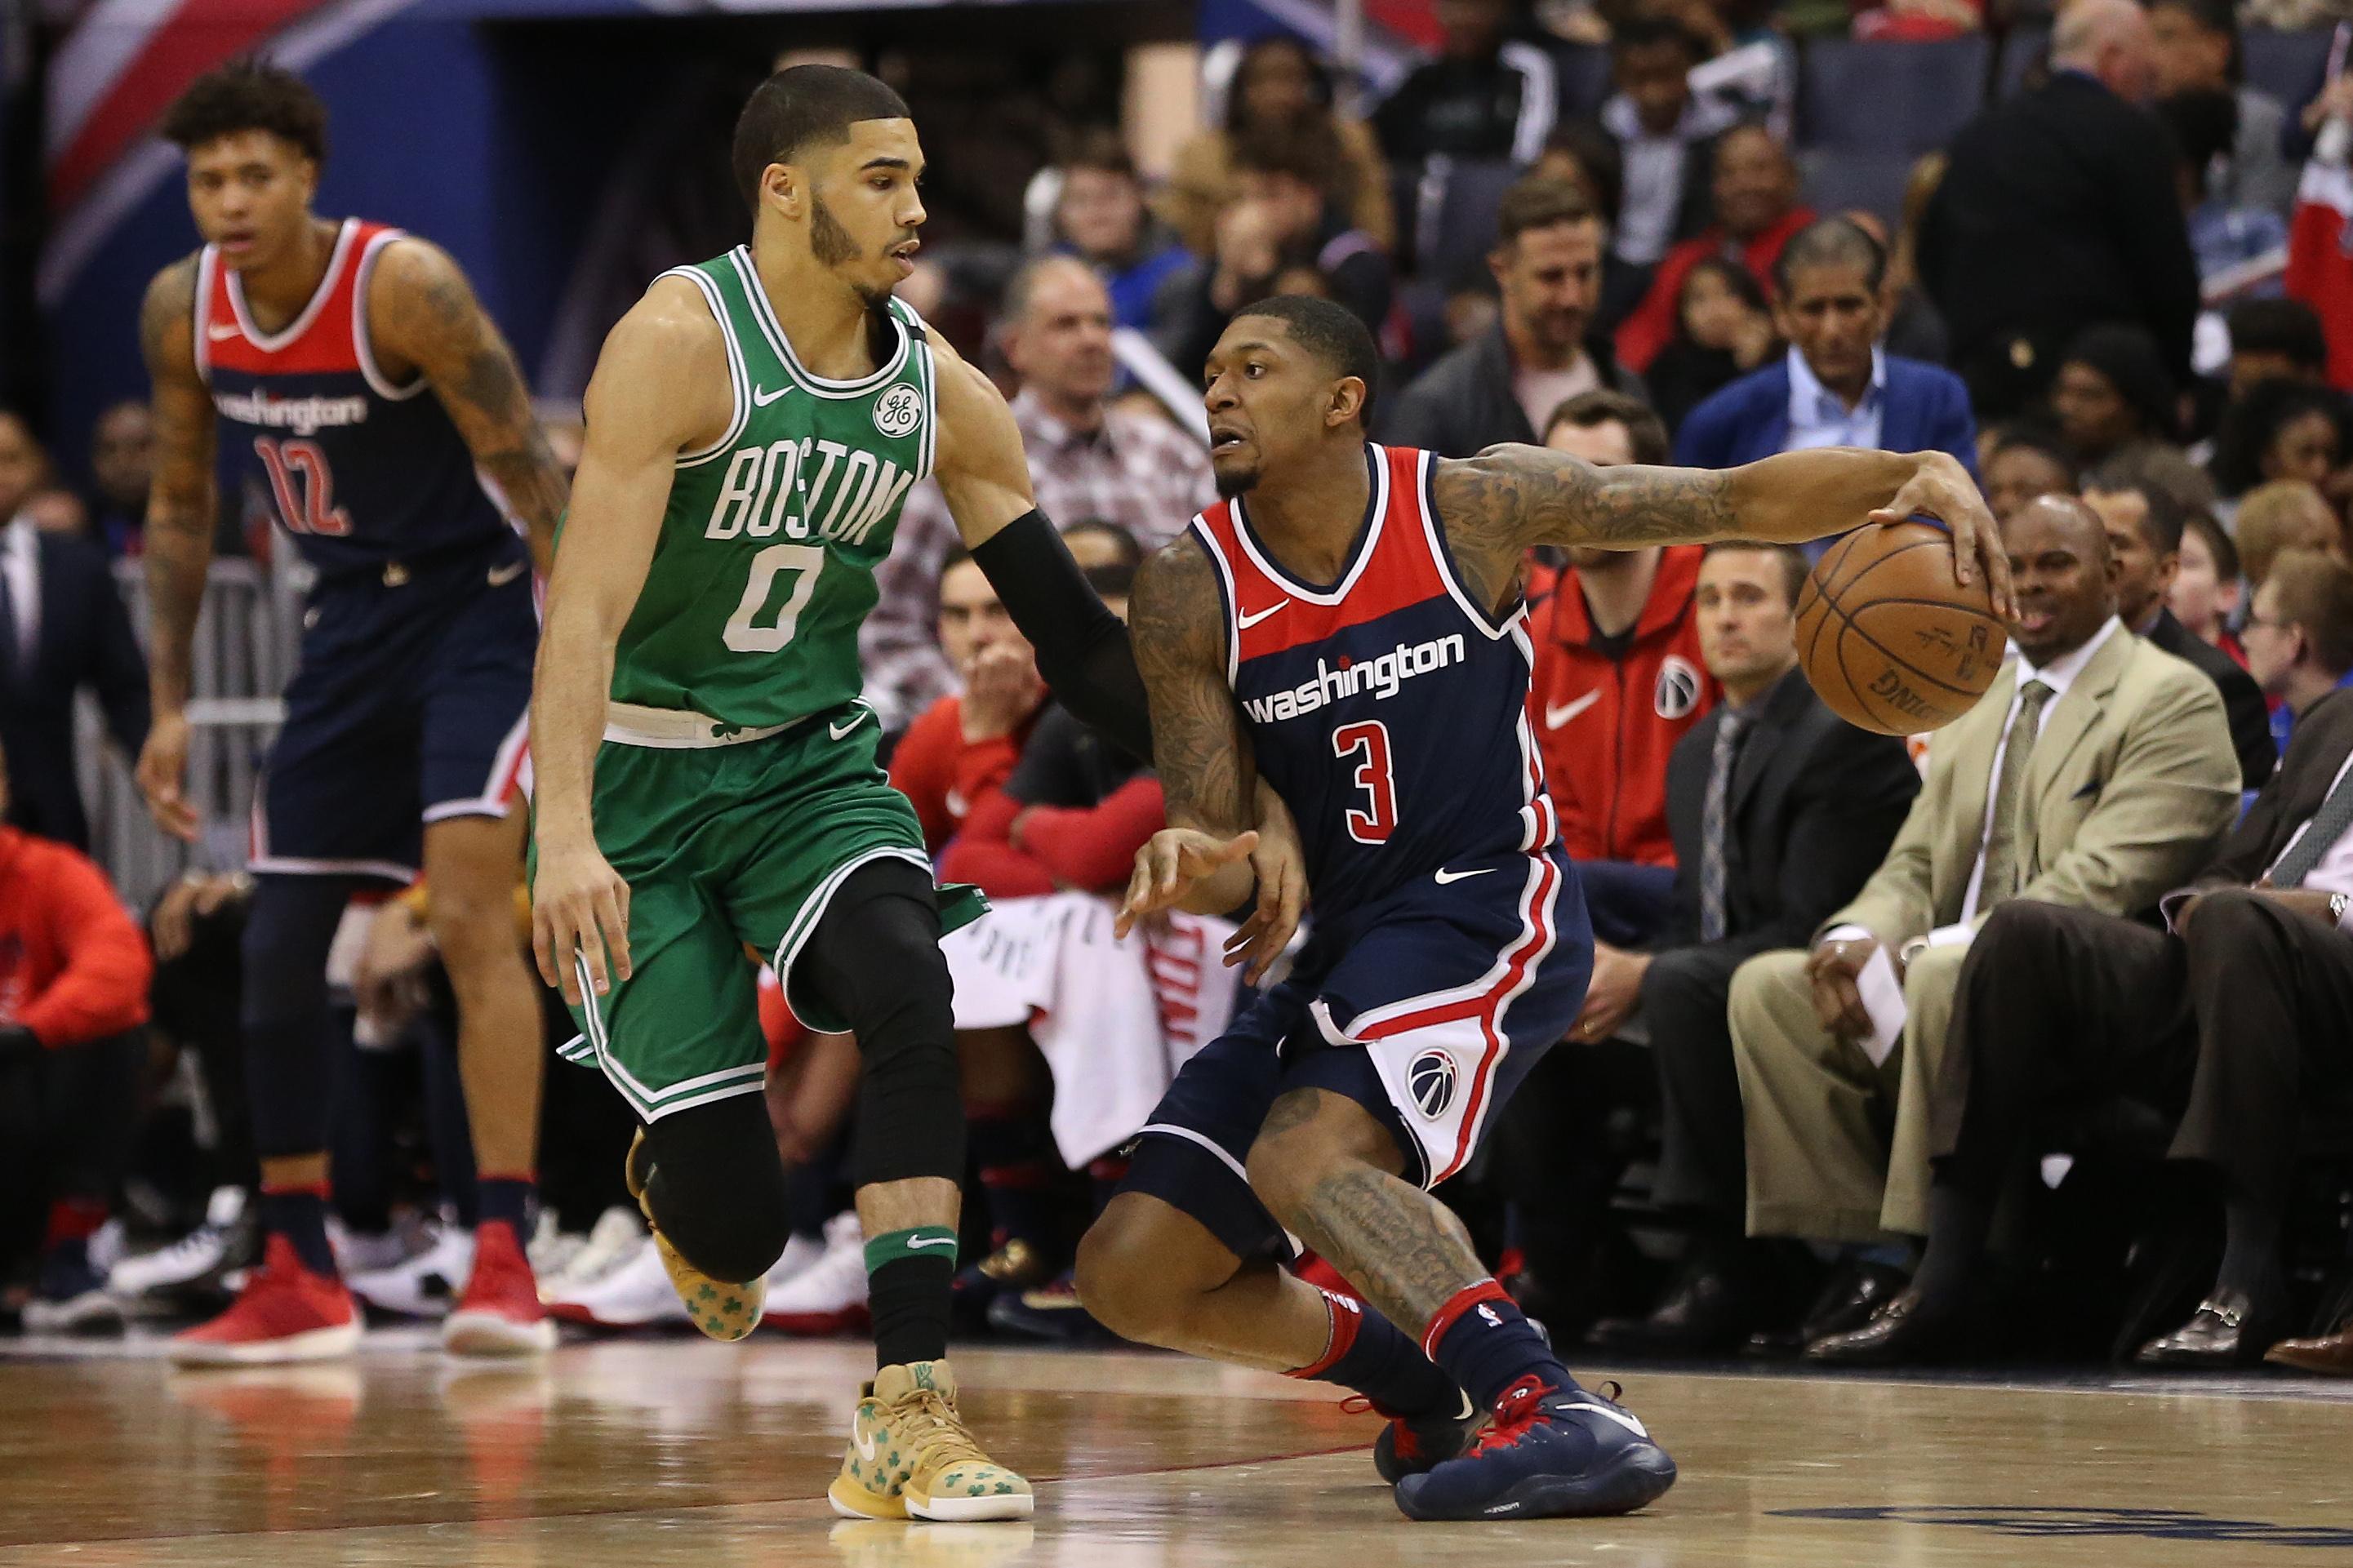 NBA: Boston Celtics at Washington Wizards